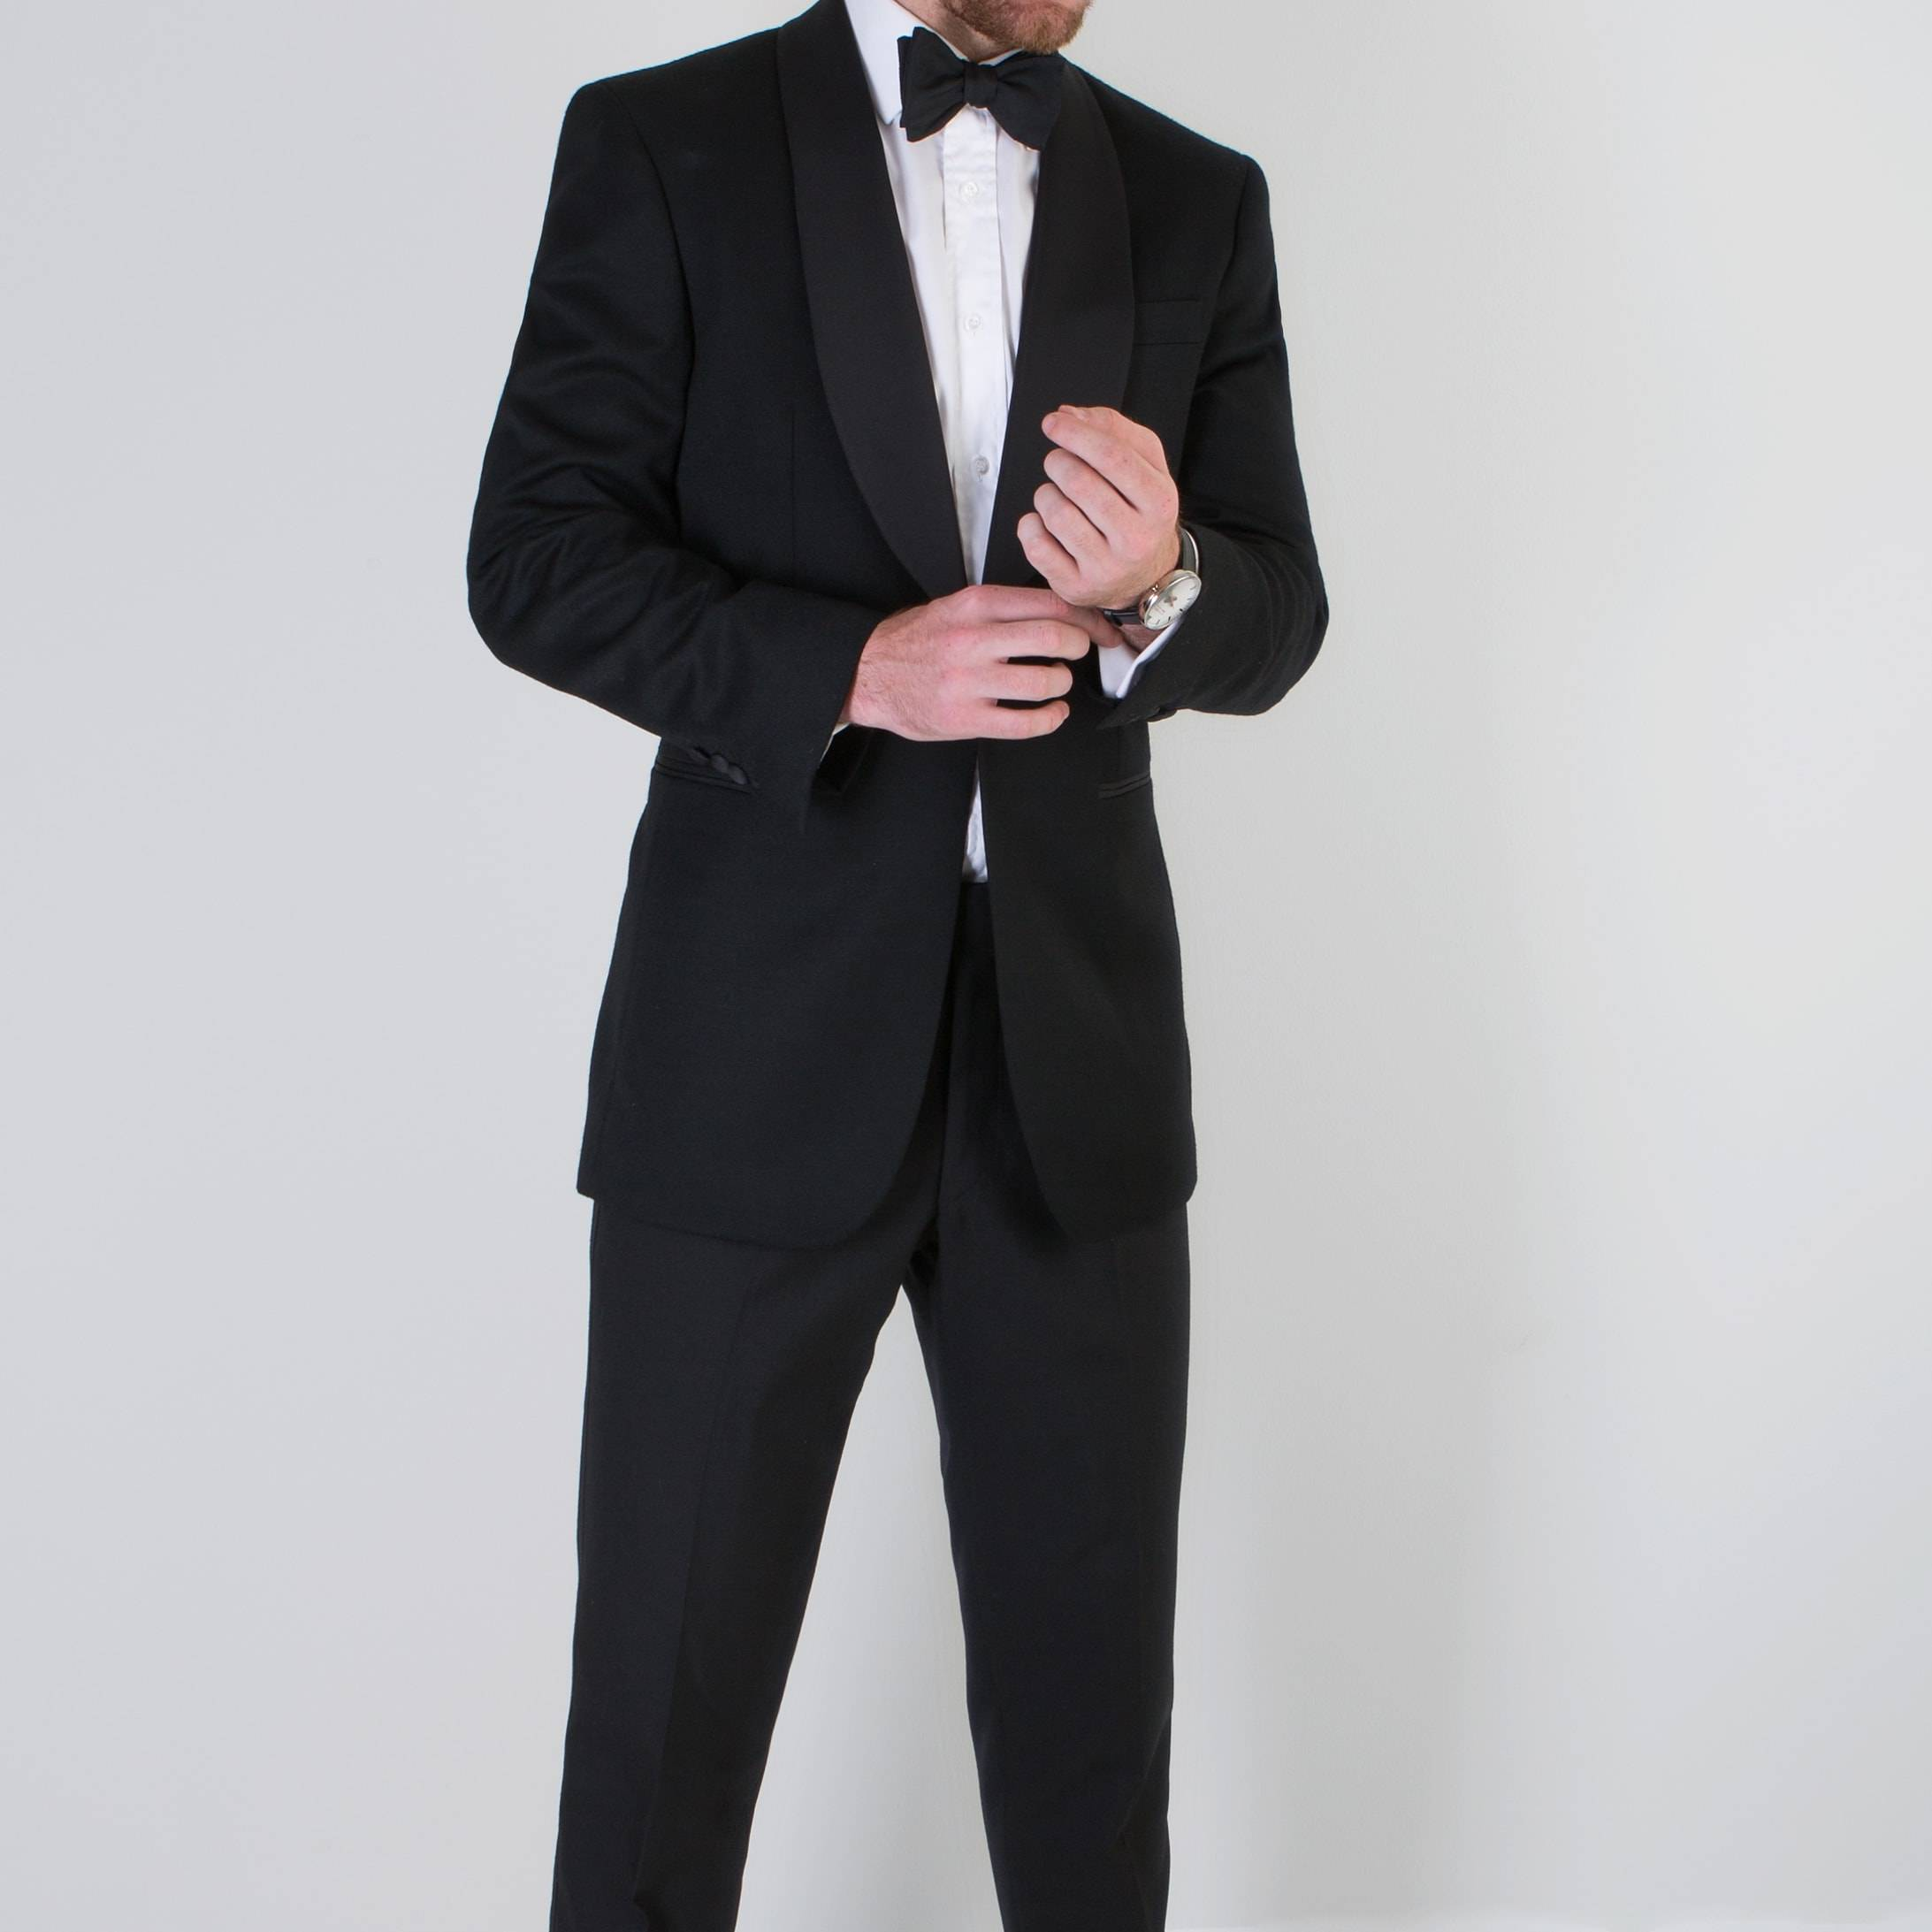 Bespoke dinner suit by Mullen and Mullen tailoring worn by gentleman